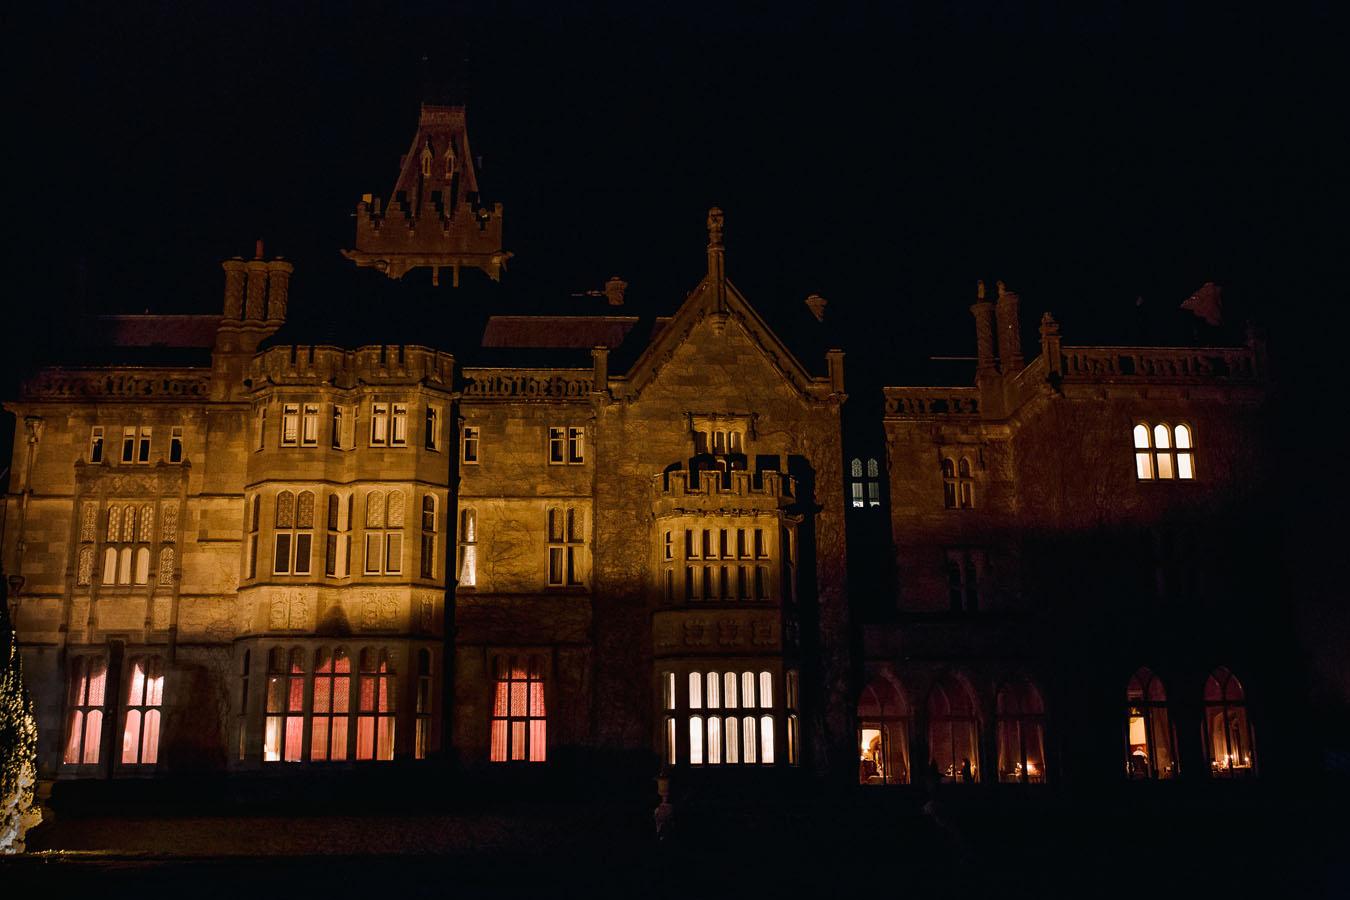 Adare manor night